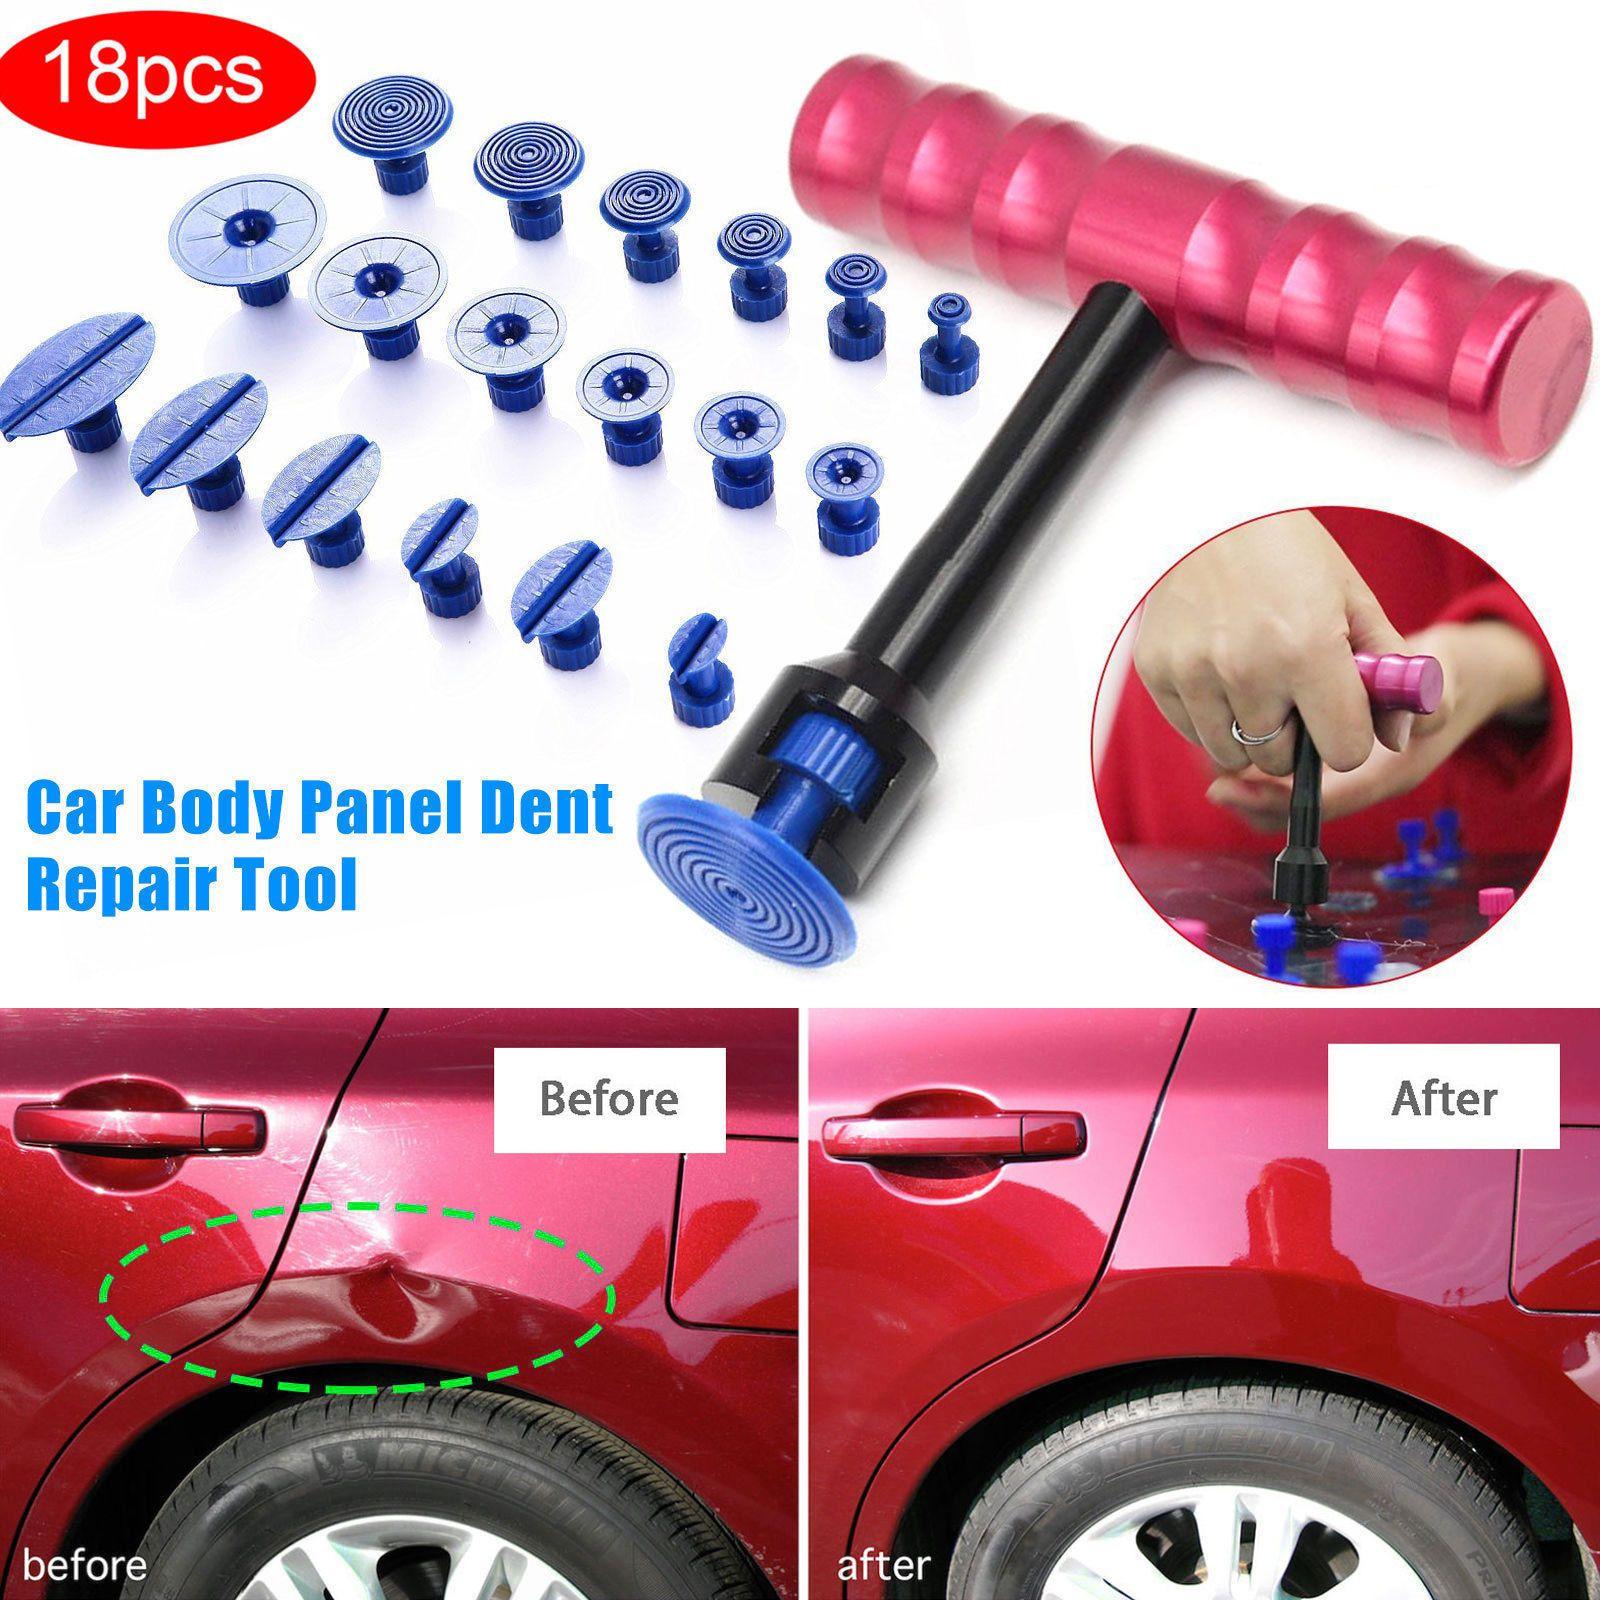 2019 18PCS المهنية T-بار جسم السيارة لوحة Paintless دنت إصلاح إزالة أداة كهربائية + بولير علامات السيارات الدراجات النارية و الدراجات إزالة الأضرار شحن مجاني